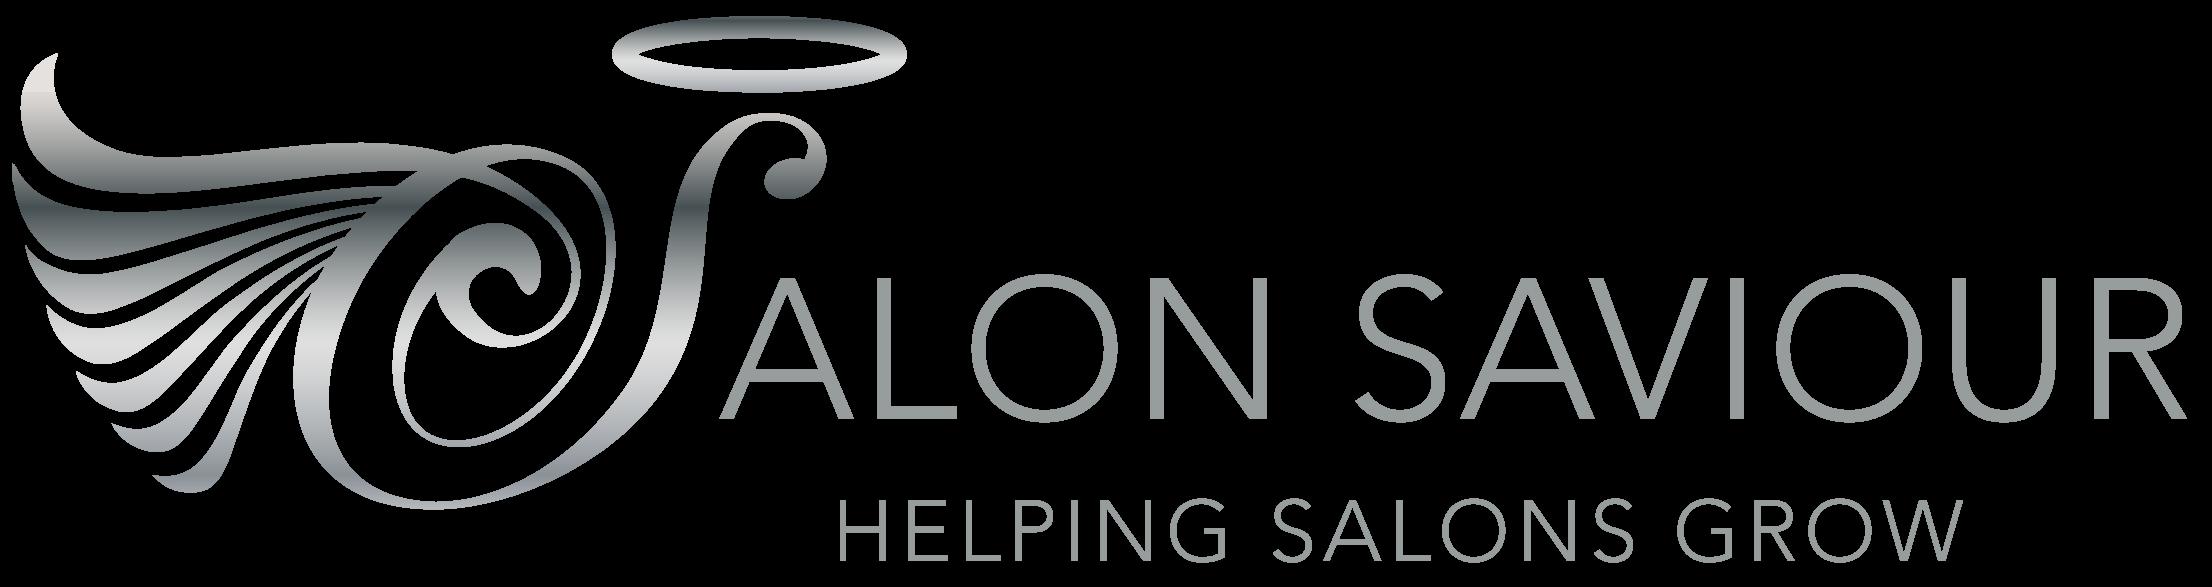 Salon Saviour